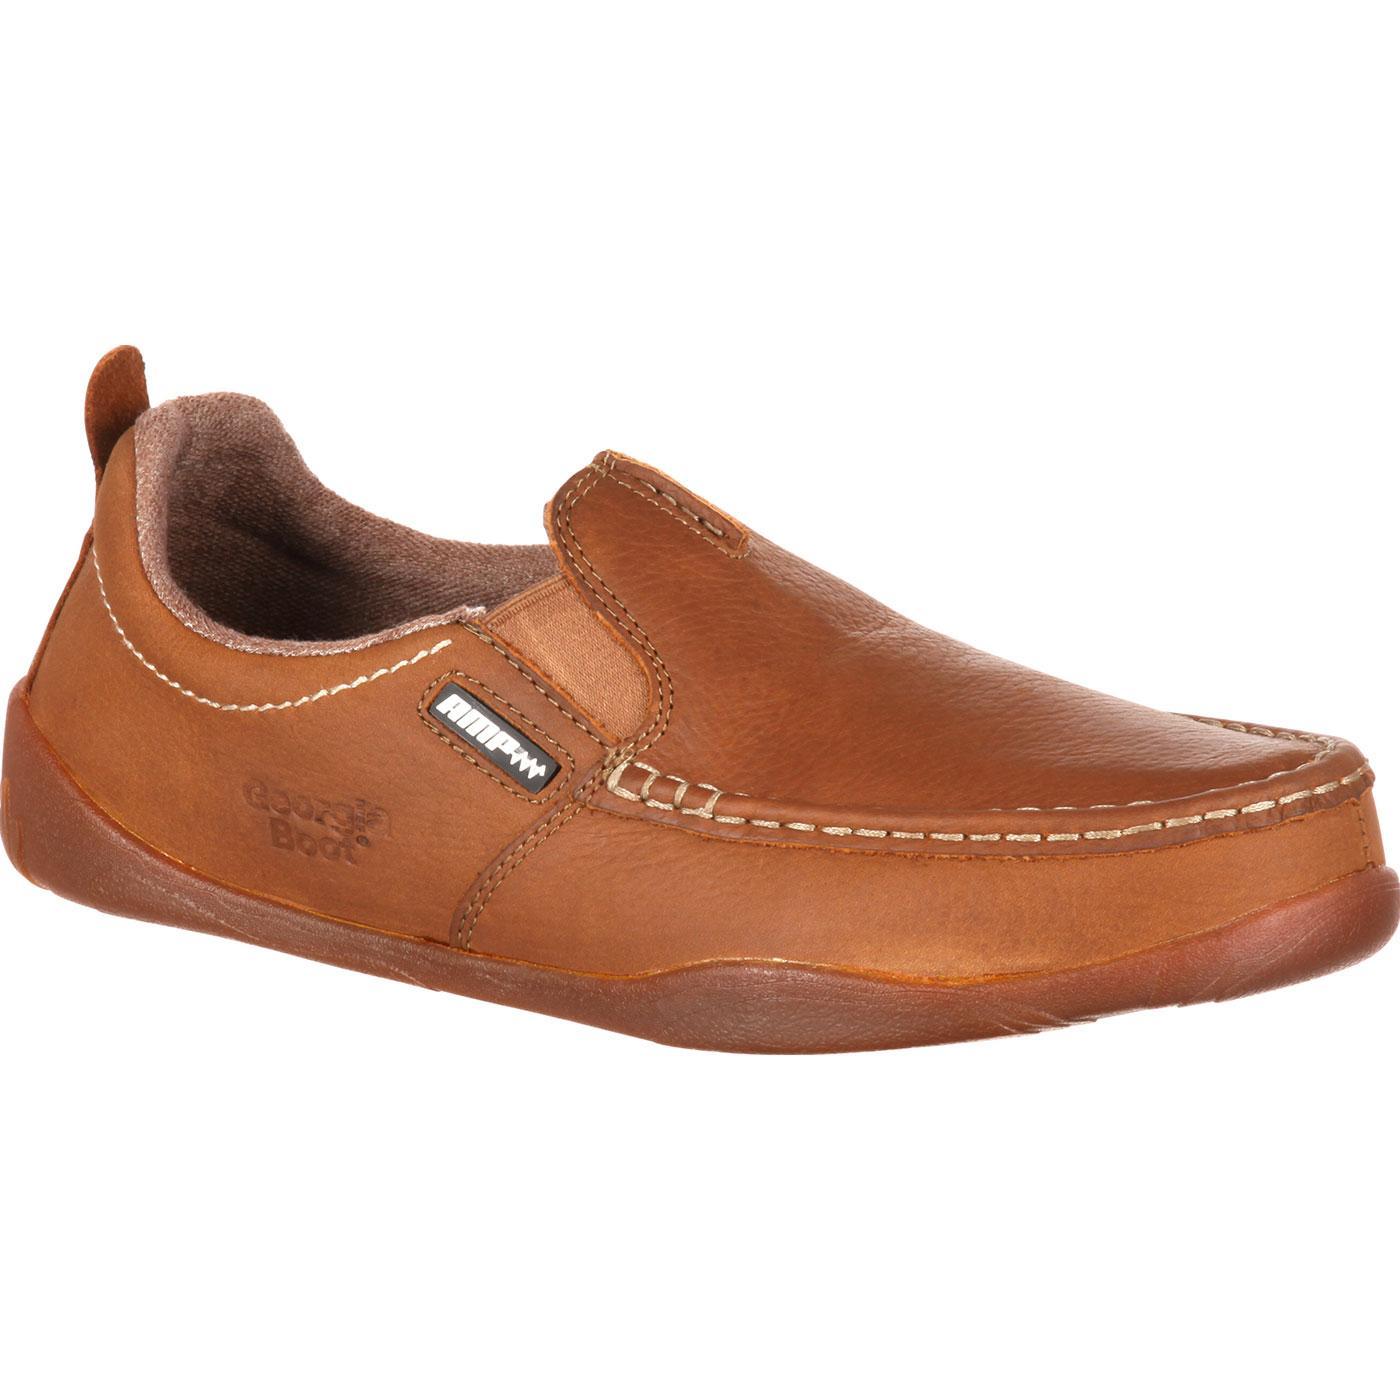 Georgia Boot Cedar Falls Men's ... Moc-Toe Slip-On Shoes B4eWxfTP